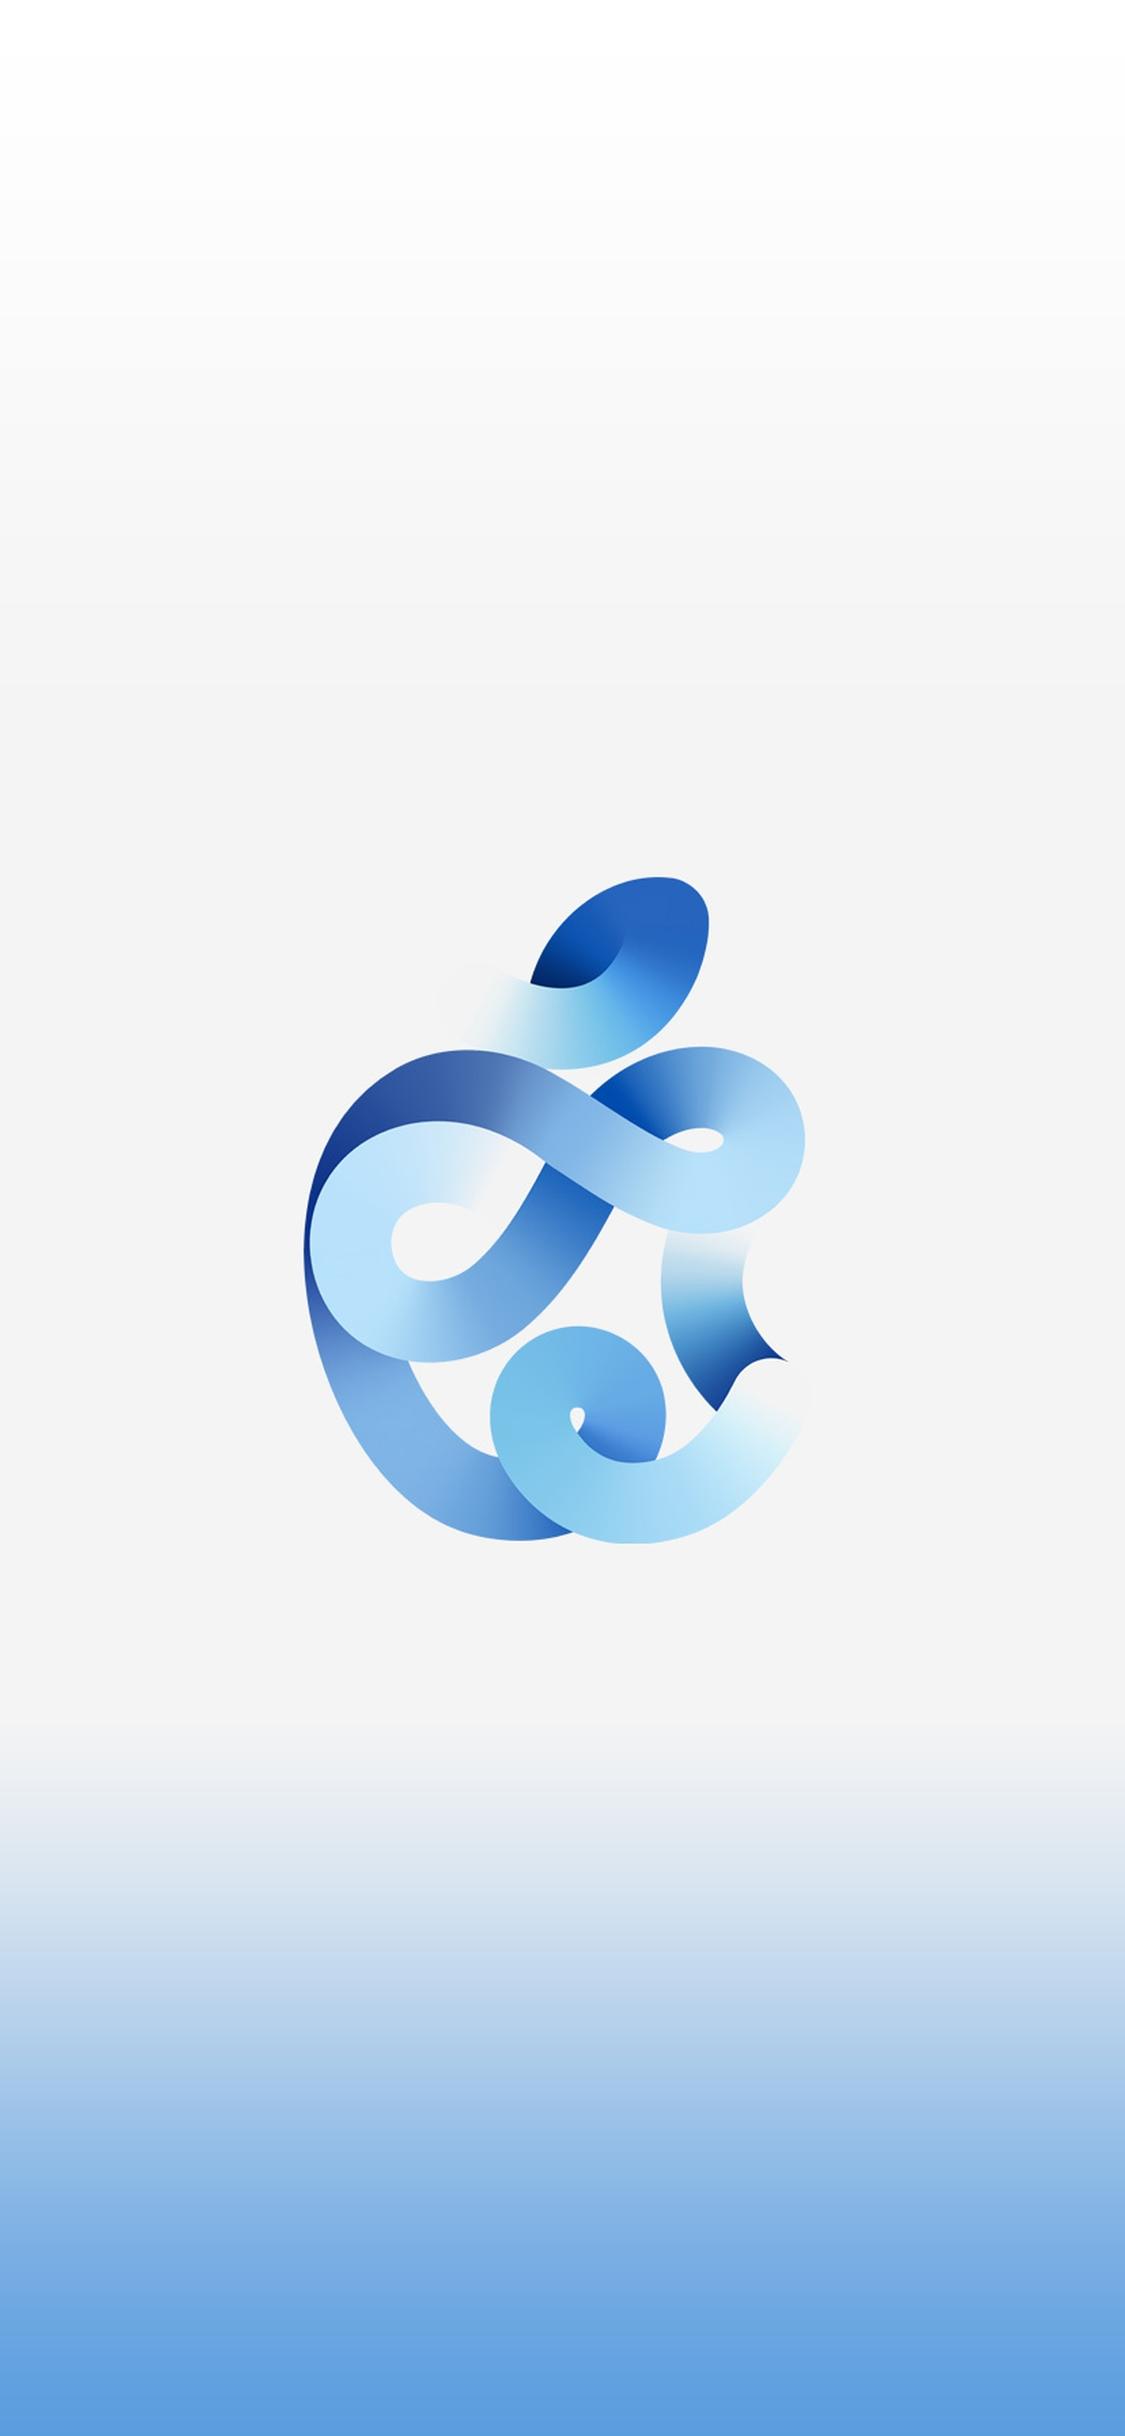 Apple September 15 event time flies iphone wallpaper saleemusama idownloadblog BlueBottom